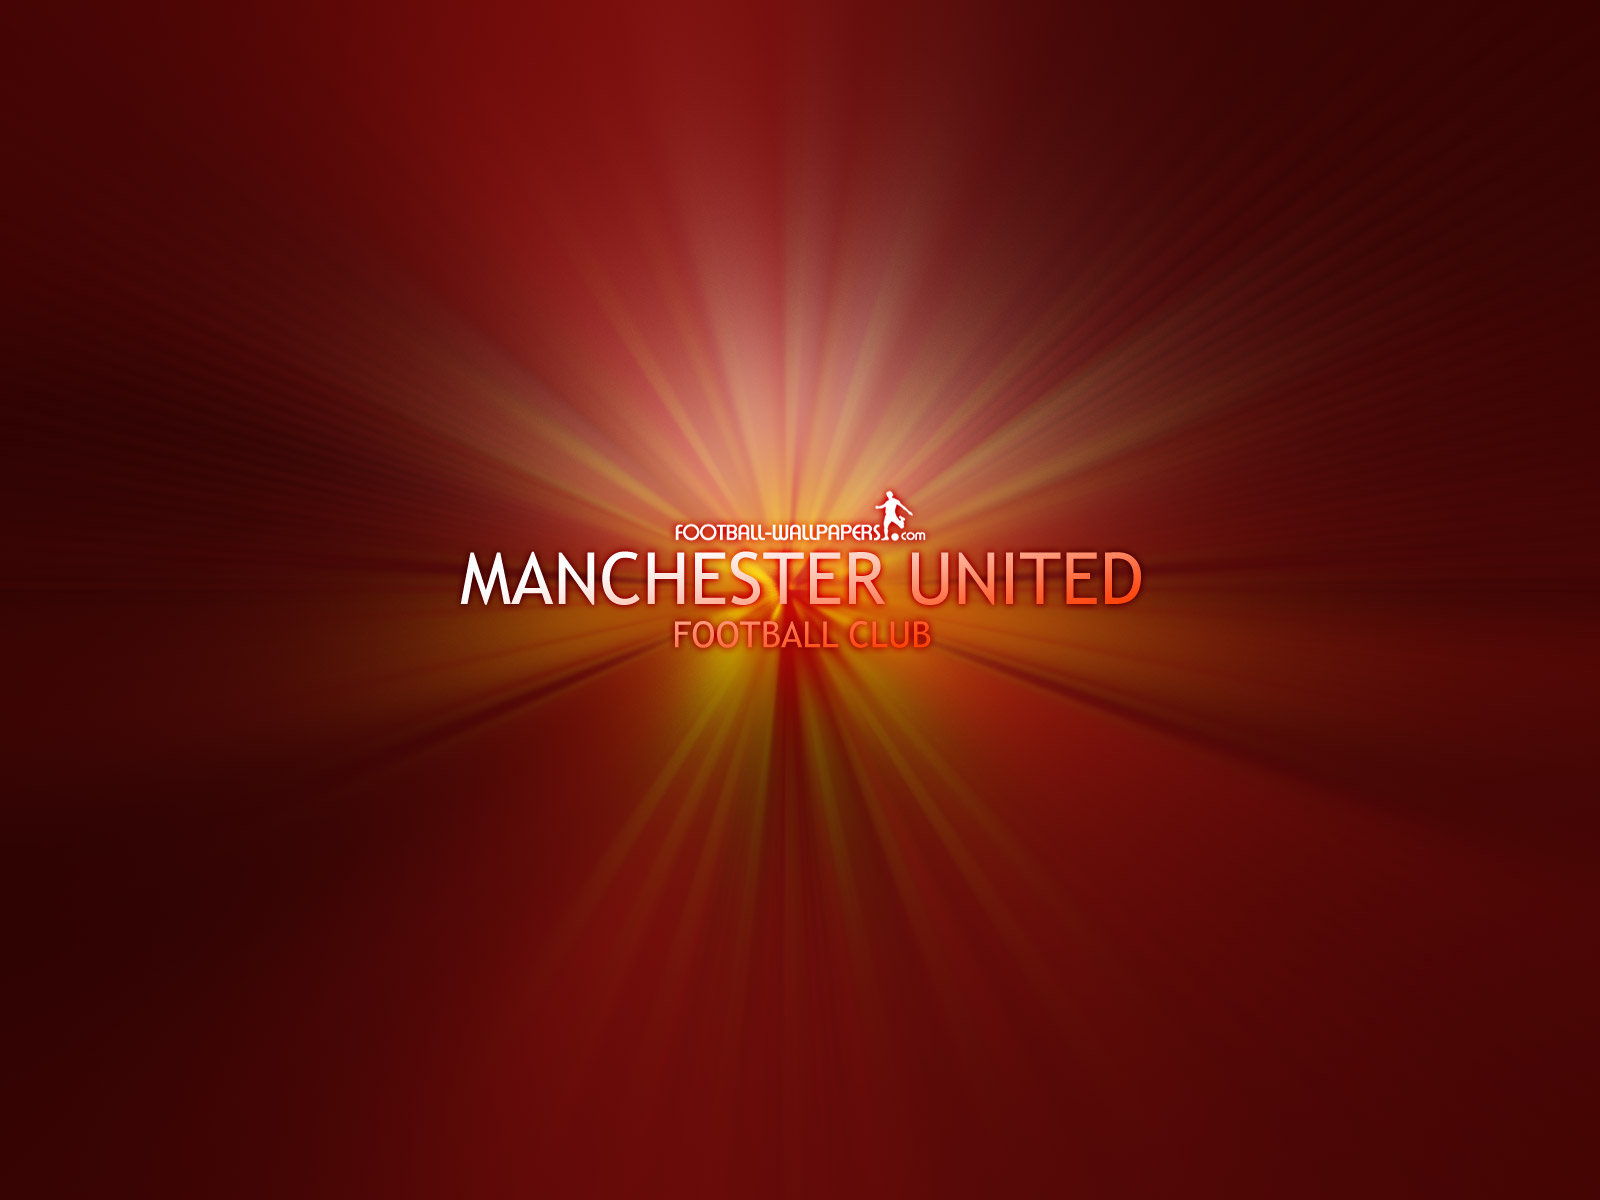 Manchester United wallpaper | Desktop Wallpapers - Free HD Wallpapers